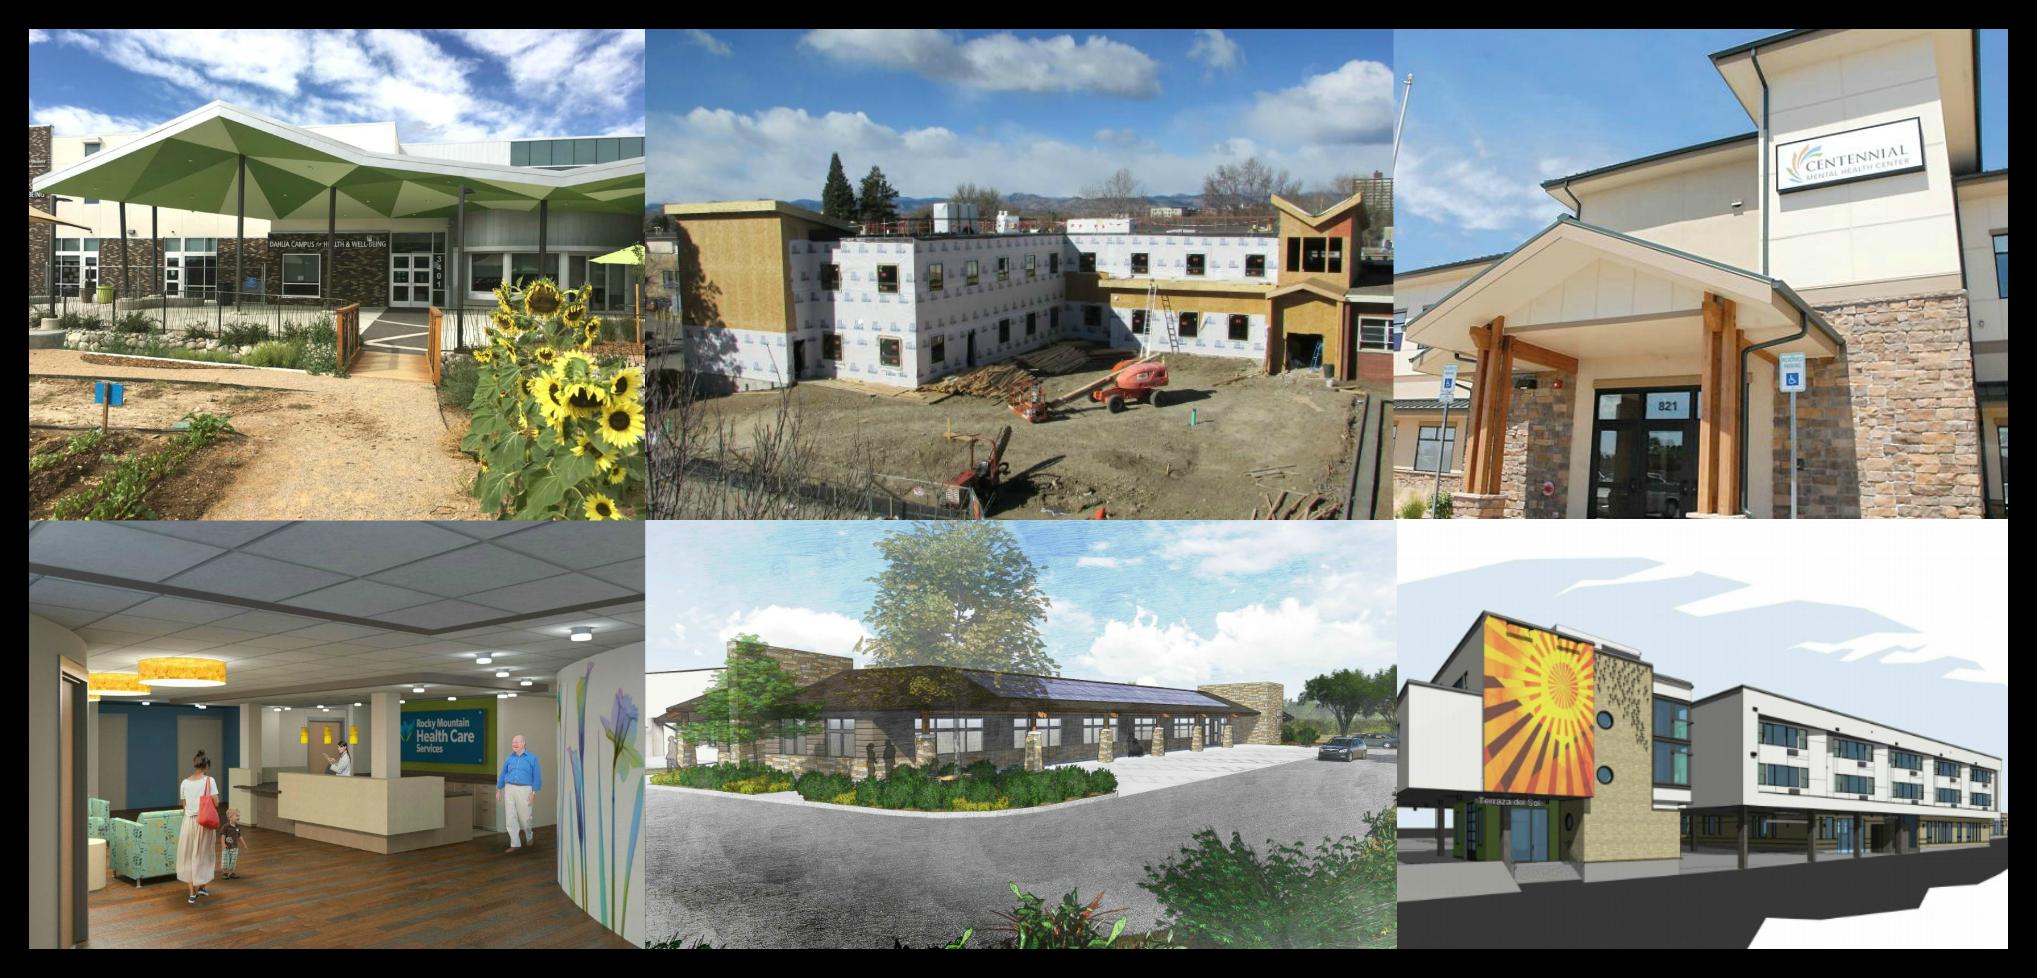 Community Building Brick-by-Brick -